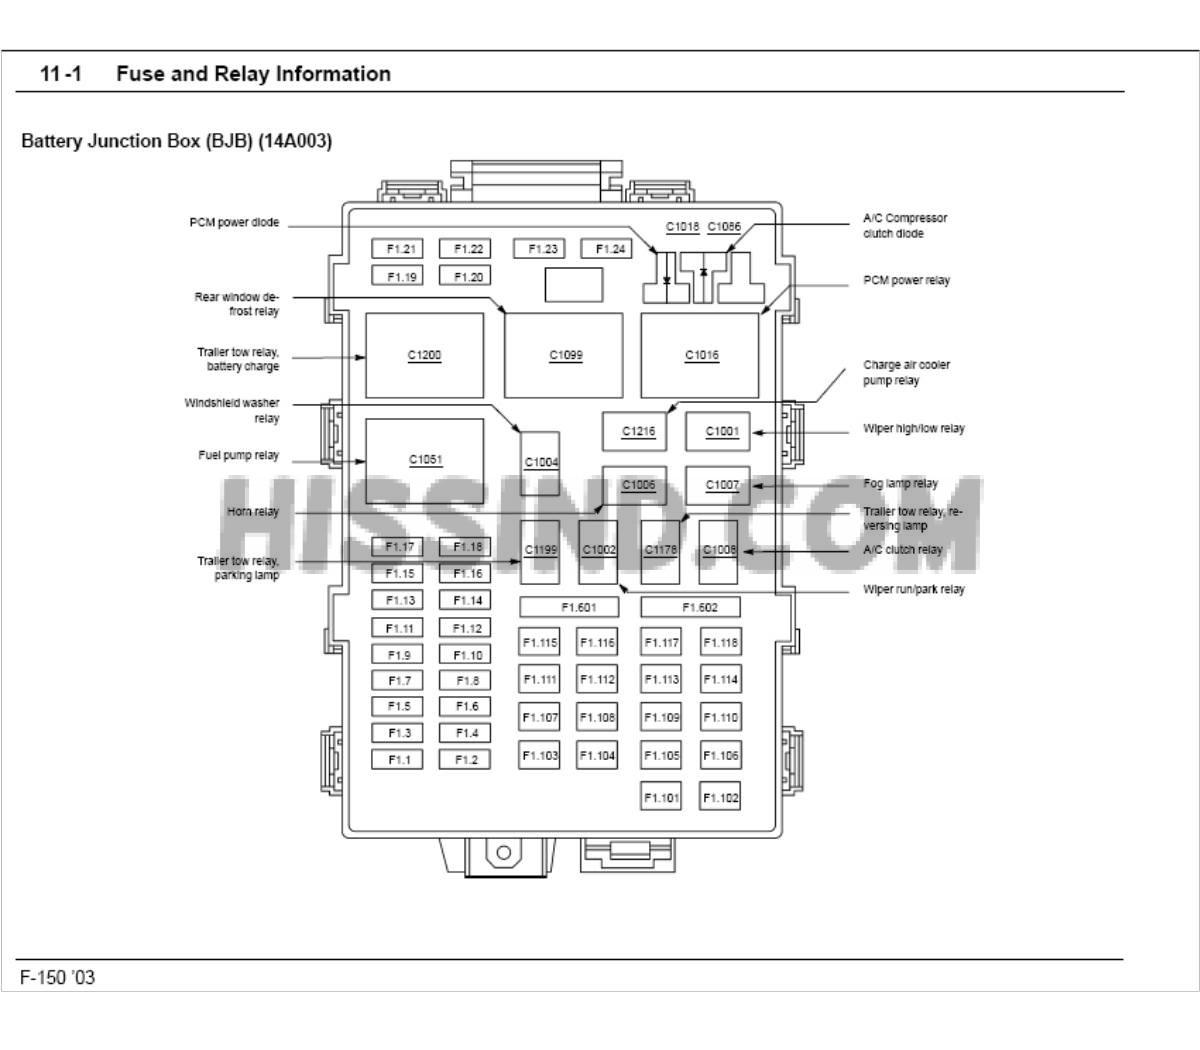 2000 F150 Fuse Box Diagram Trusted Wiring Diagram 2004 Hyundai Santa Fe Fuse  Box Diagram 05 F150 Fuse Box Diagram